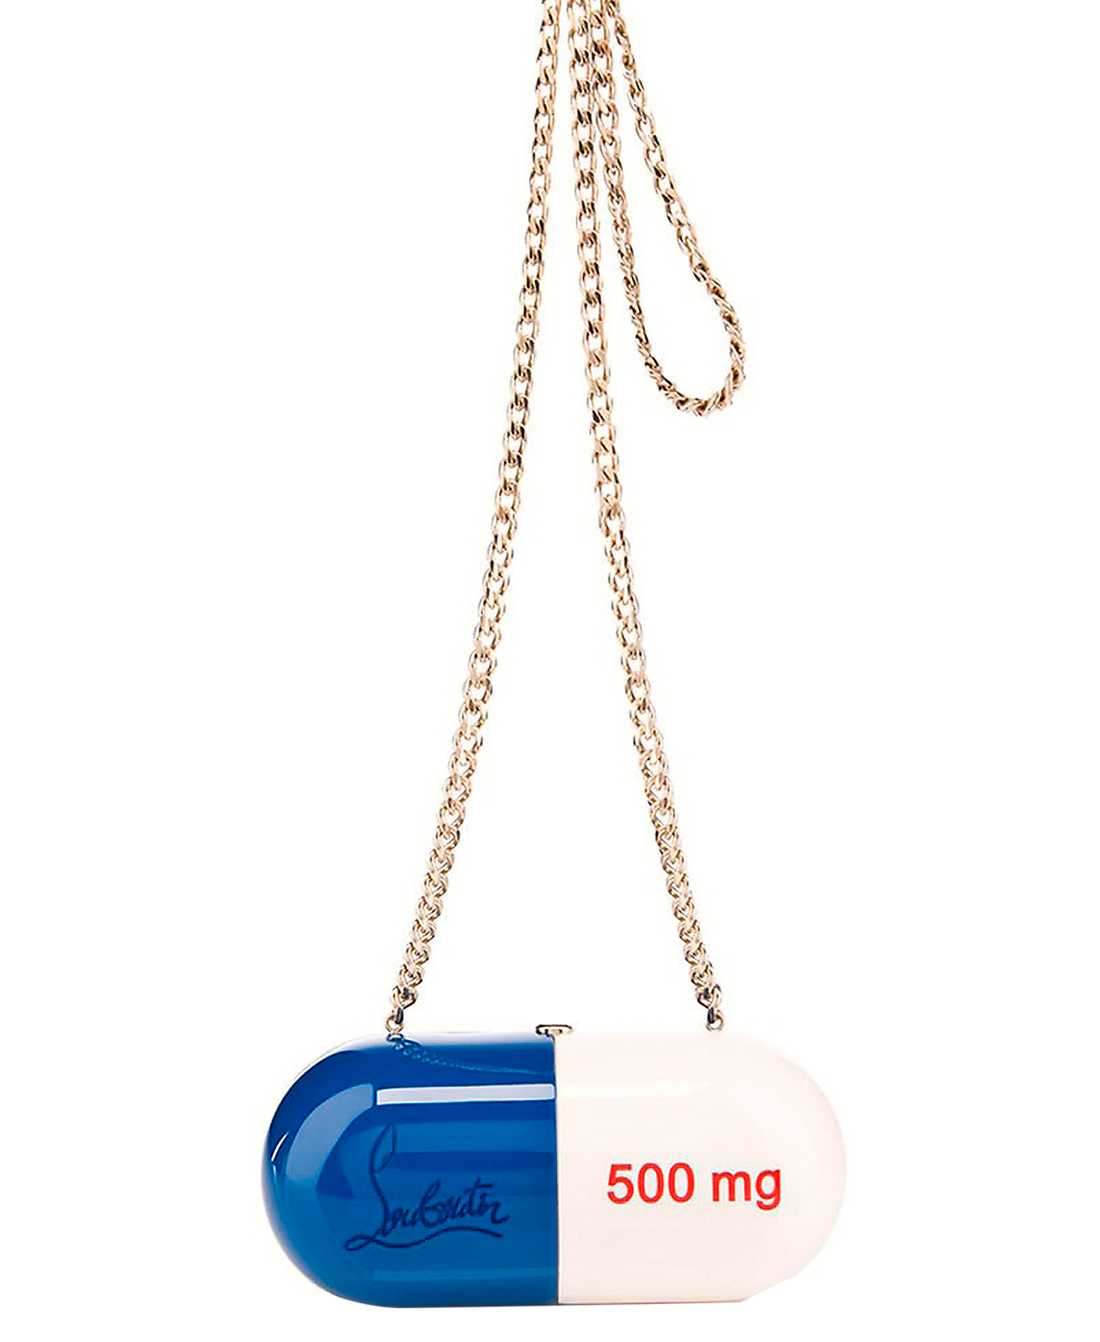 Christian Louboutins pillerväska kostar cirka 48000 kronor.